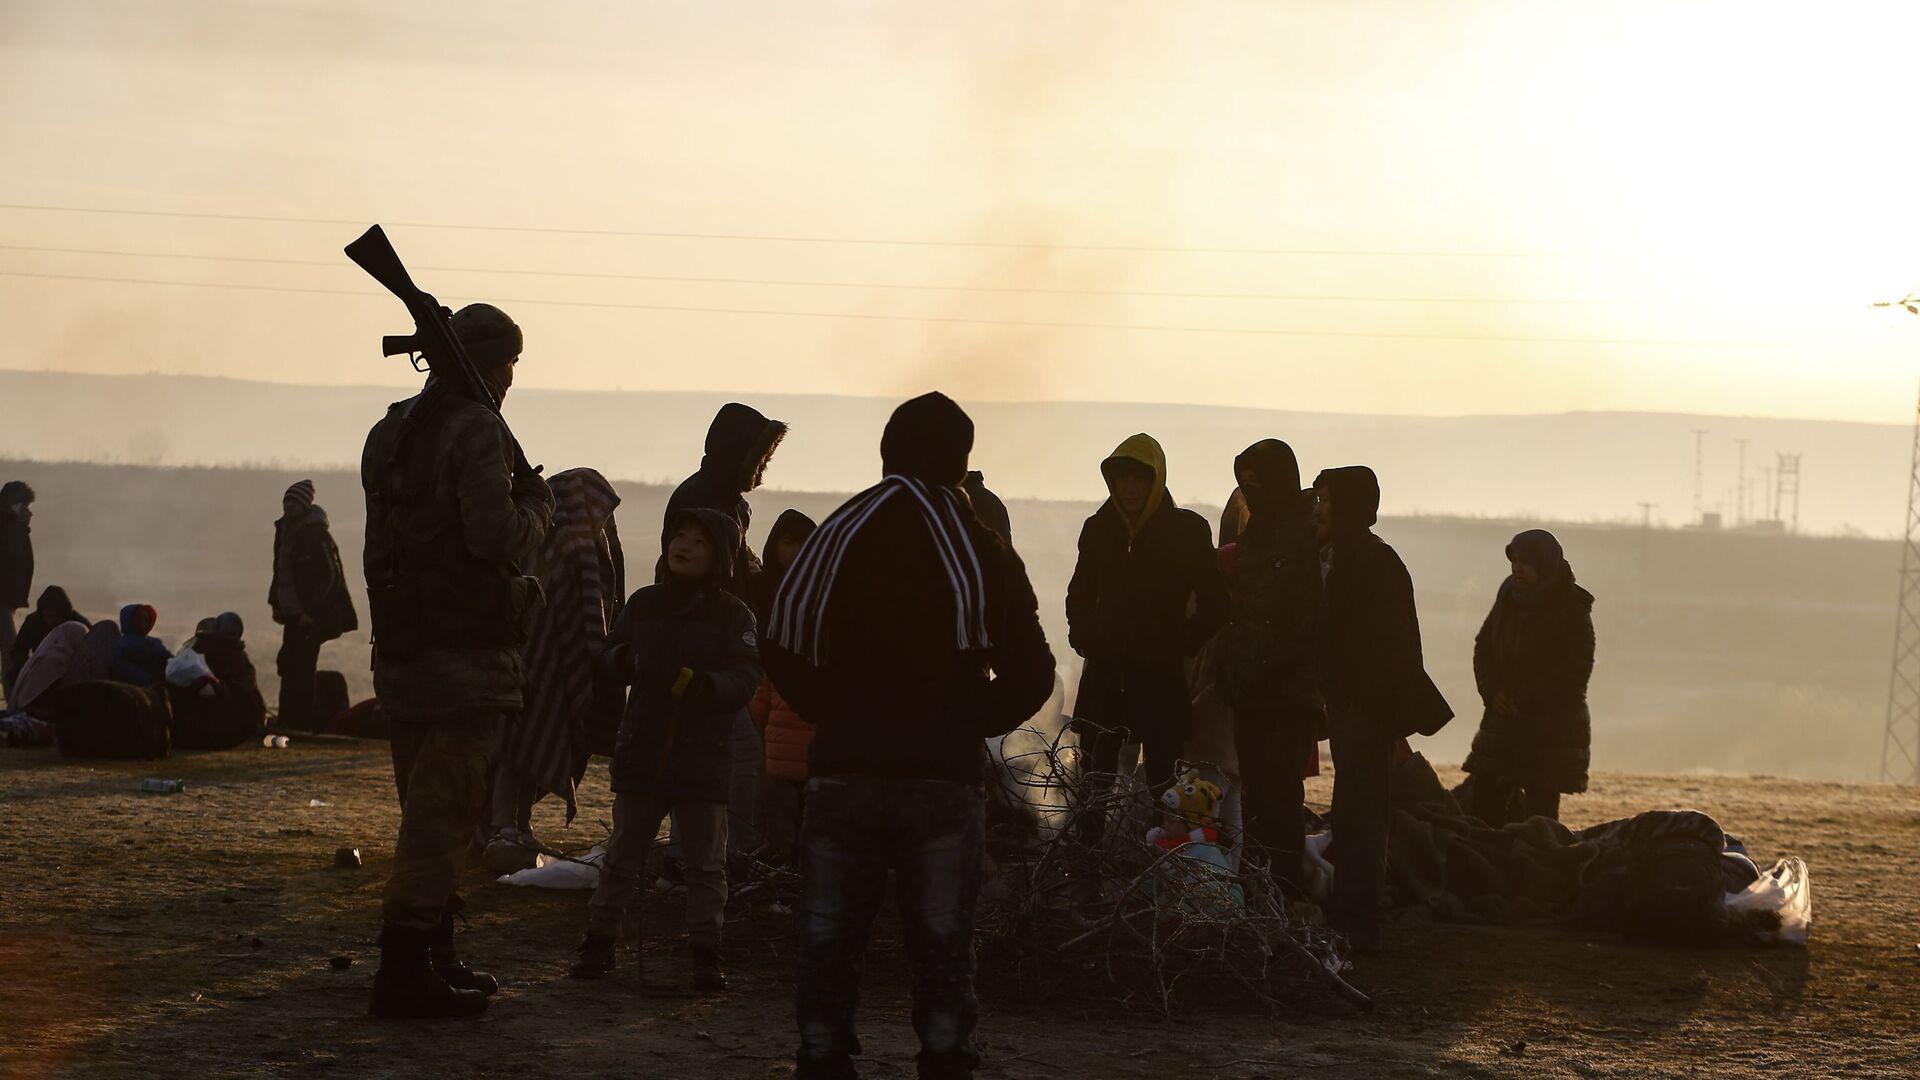 Migranti radunati al fiume Maritsa, Edirne, Turchia, Marzo 2020 - Sputnik Italia, 1920, 26.03.2021